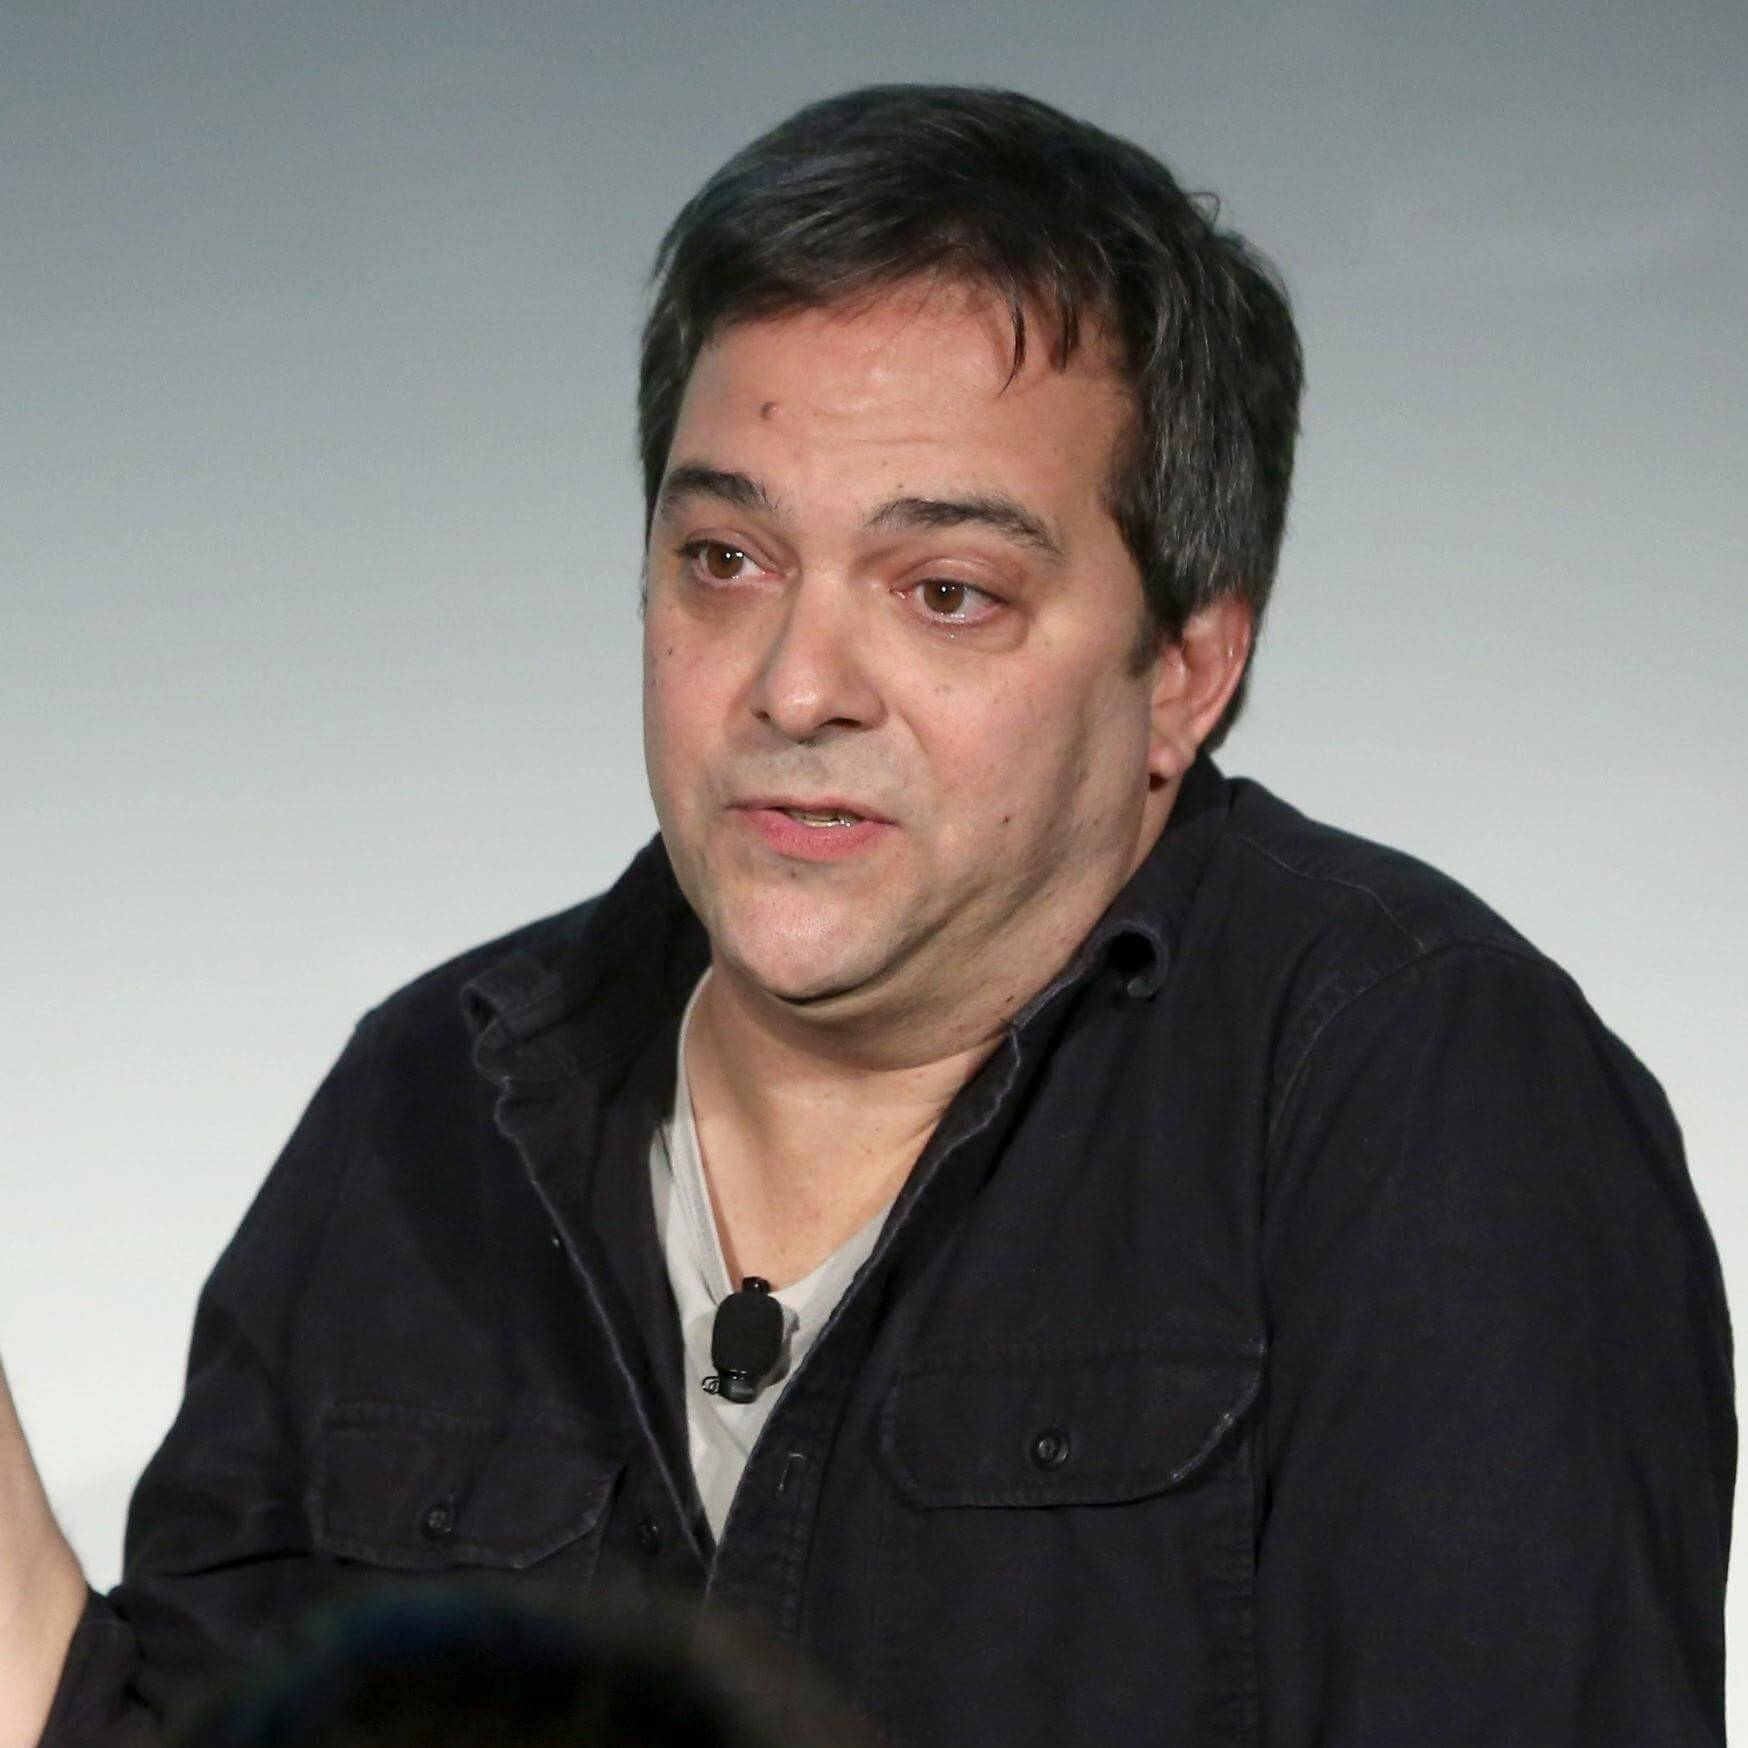 Musician and producer Adam Schlesinger